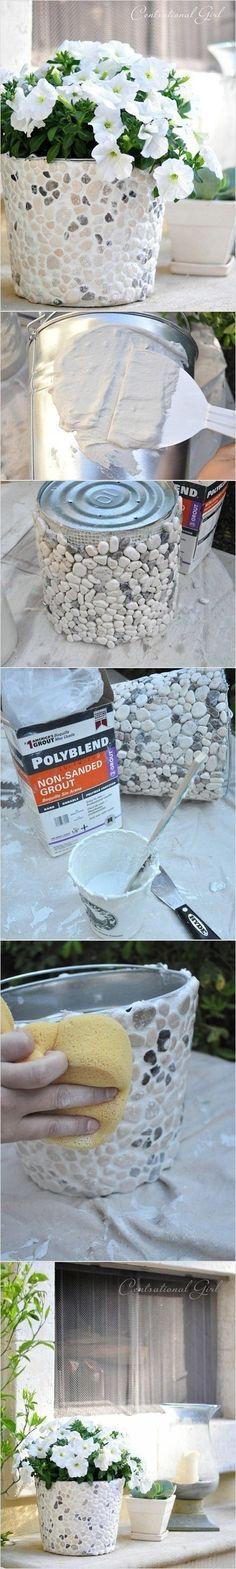 DIY Stone-Mosaic Flower Pot